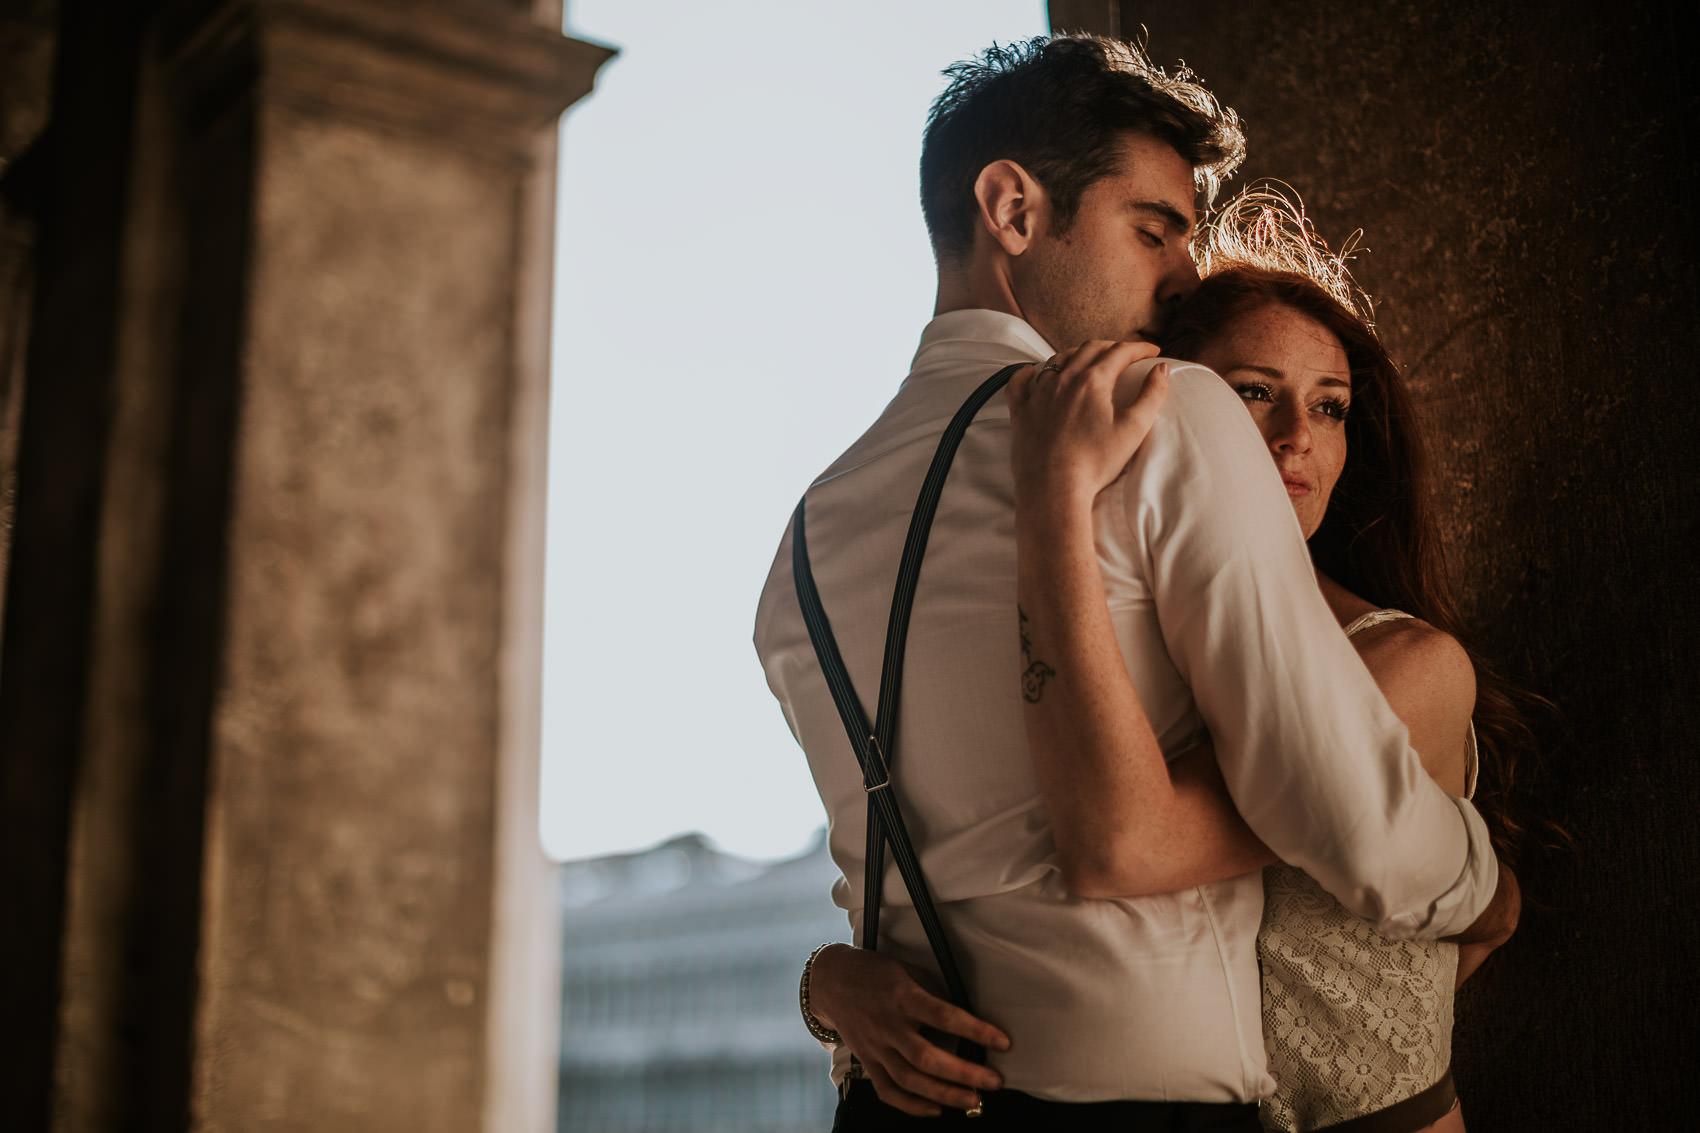 Prewedding in Venice